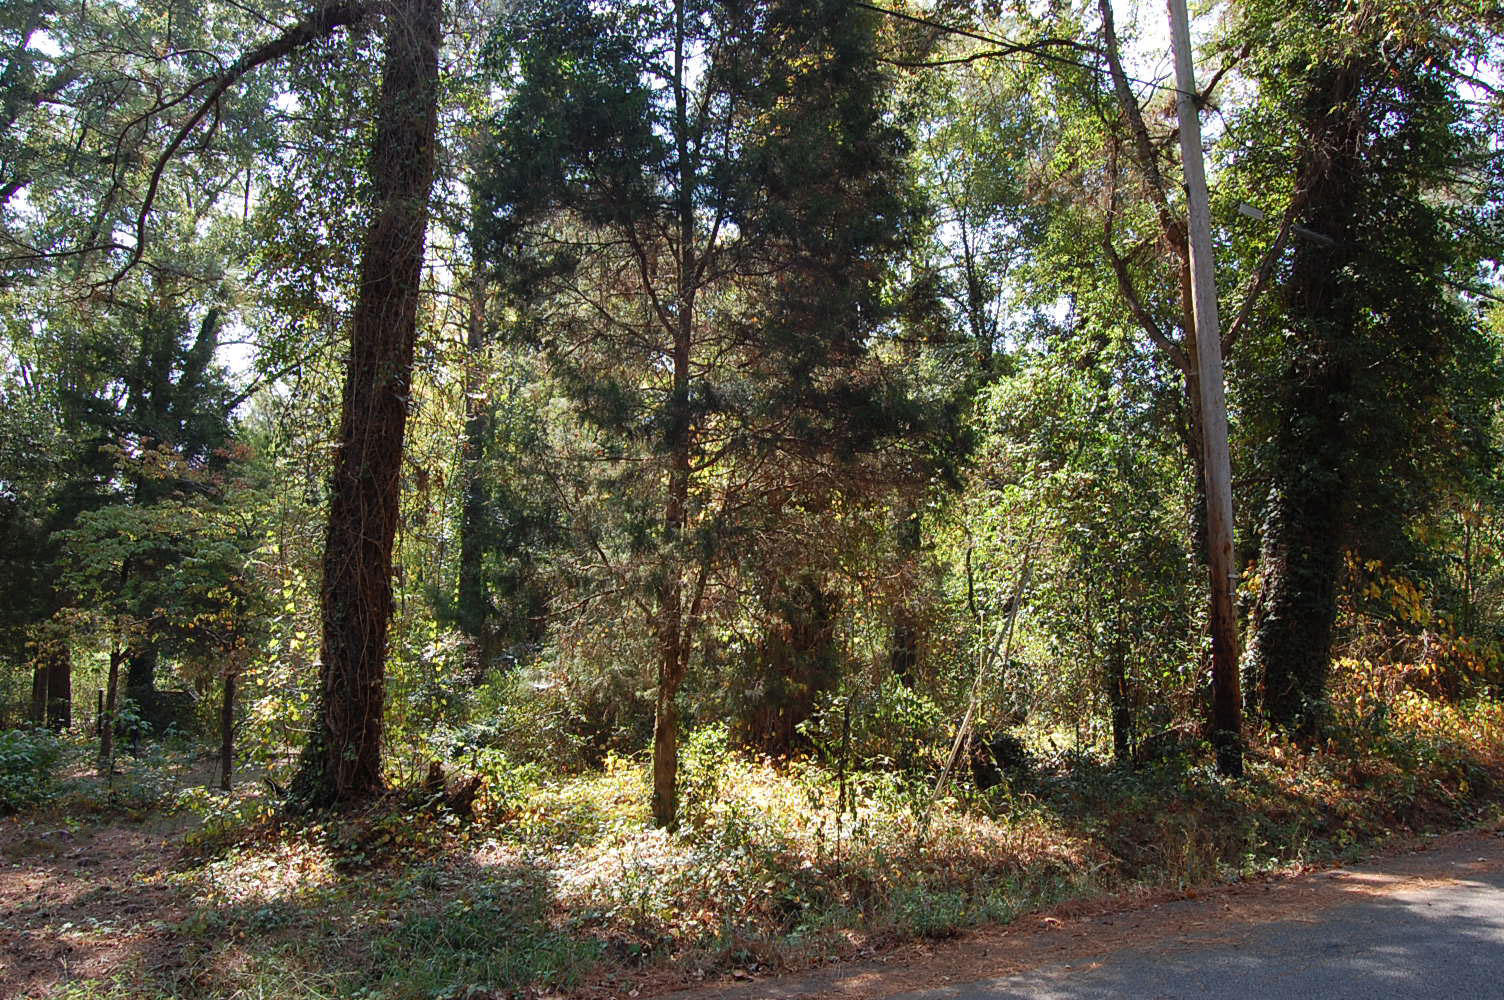 Columbia South Carolina Suburb Property - Image 4